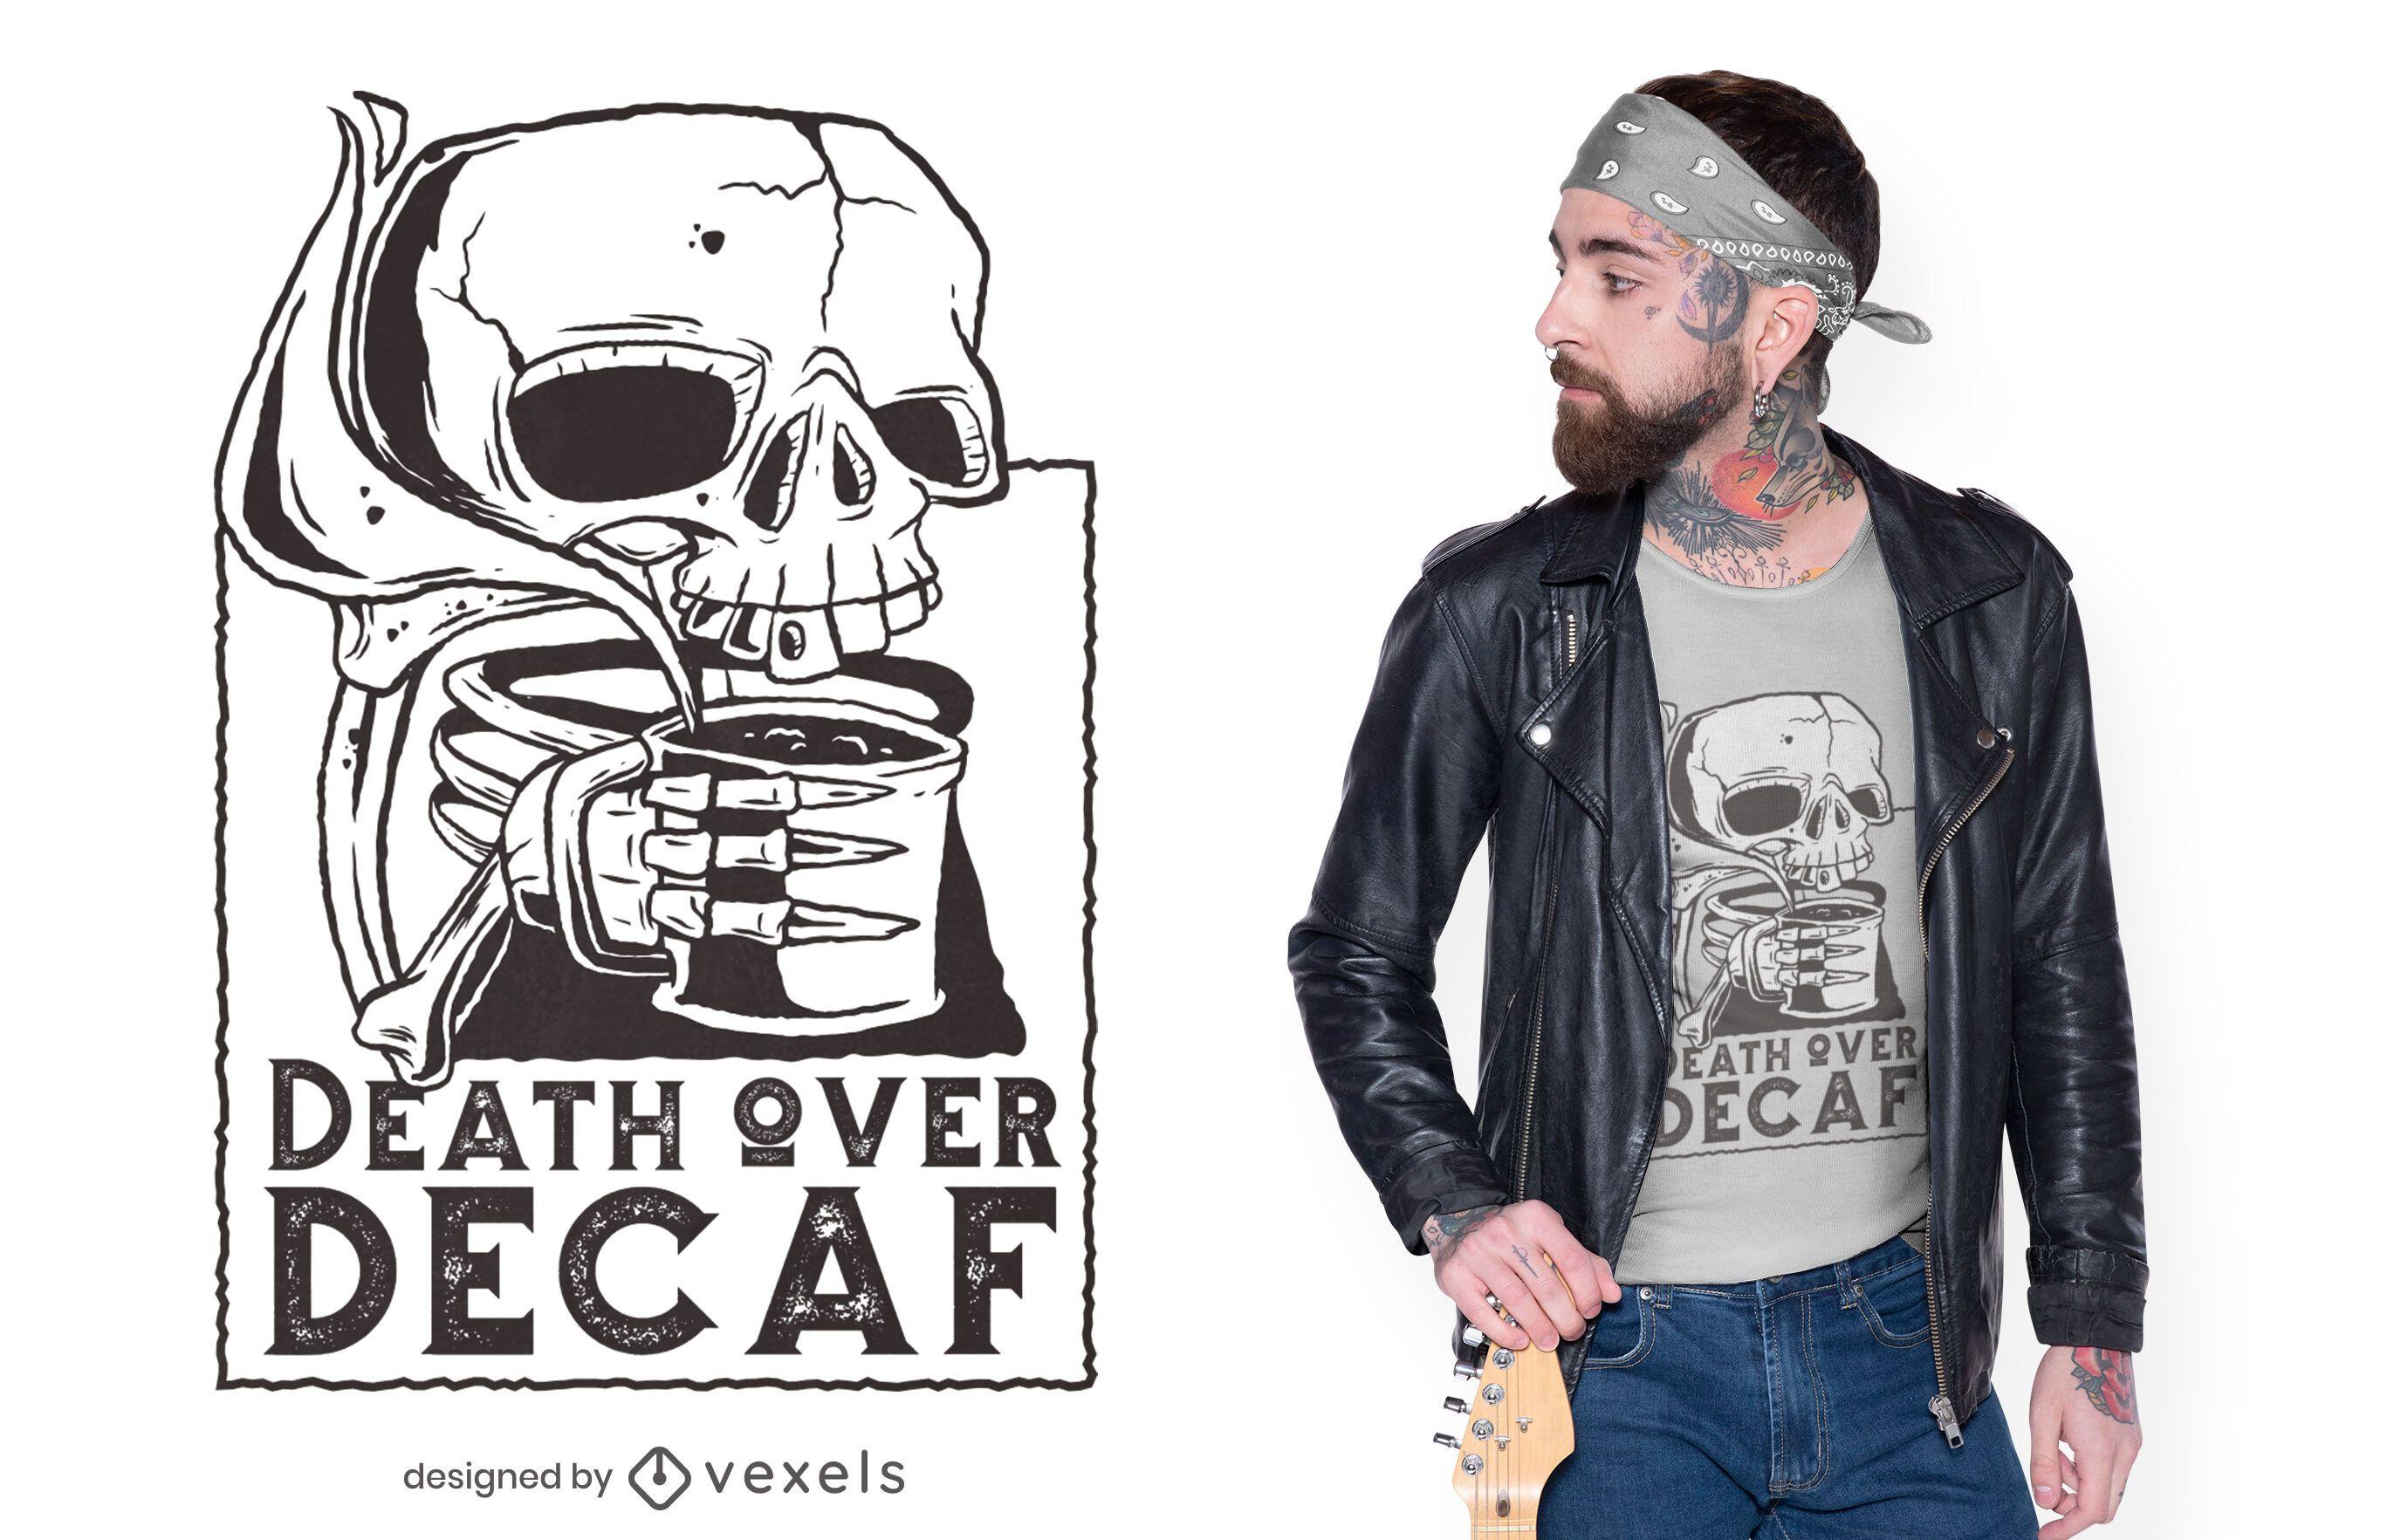 Morte pelo design de camiseta descafeinada